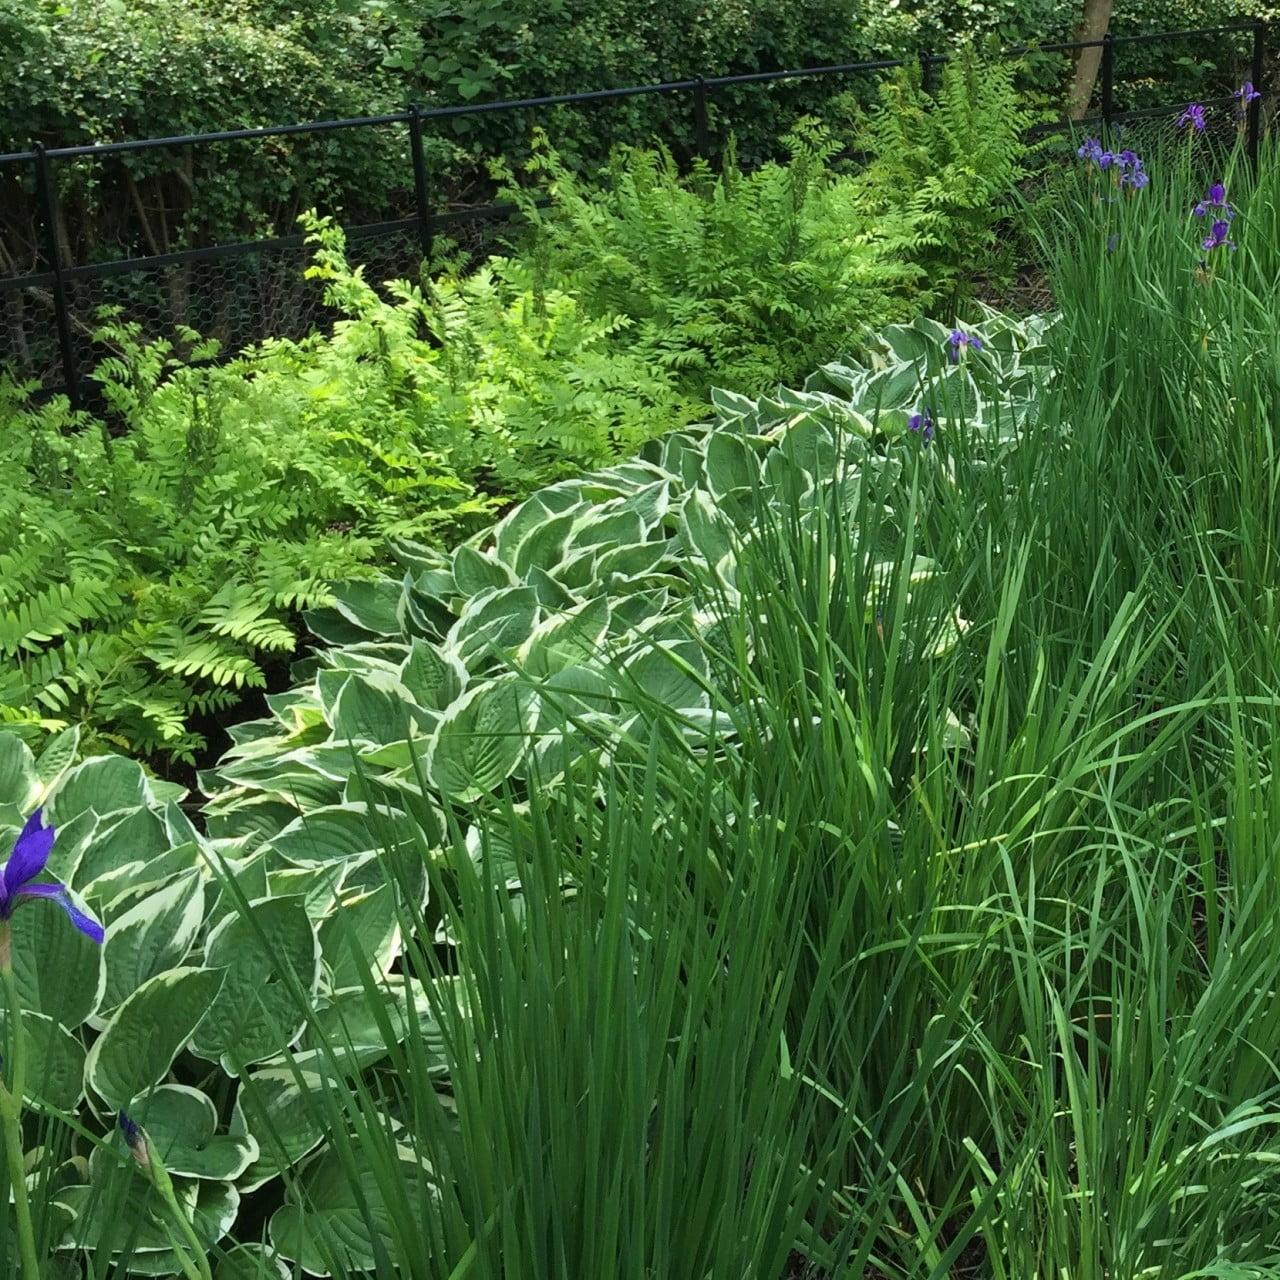 Ribbons of bog plants for my client Jane beside her boardwalk